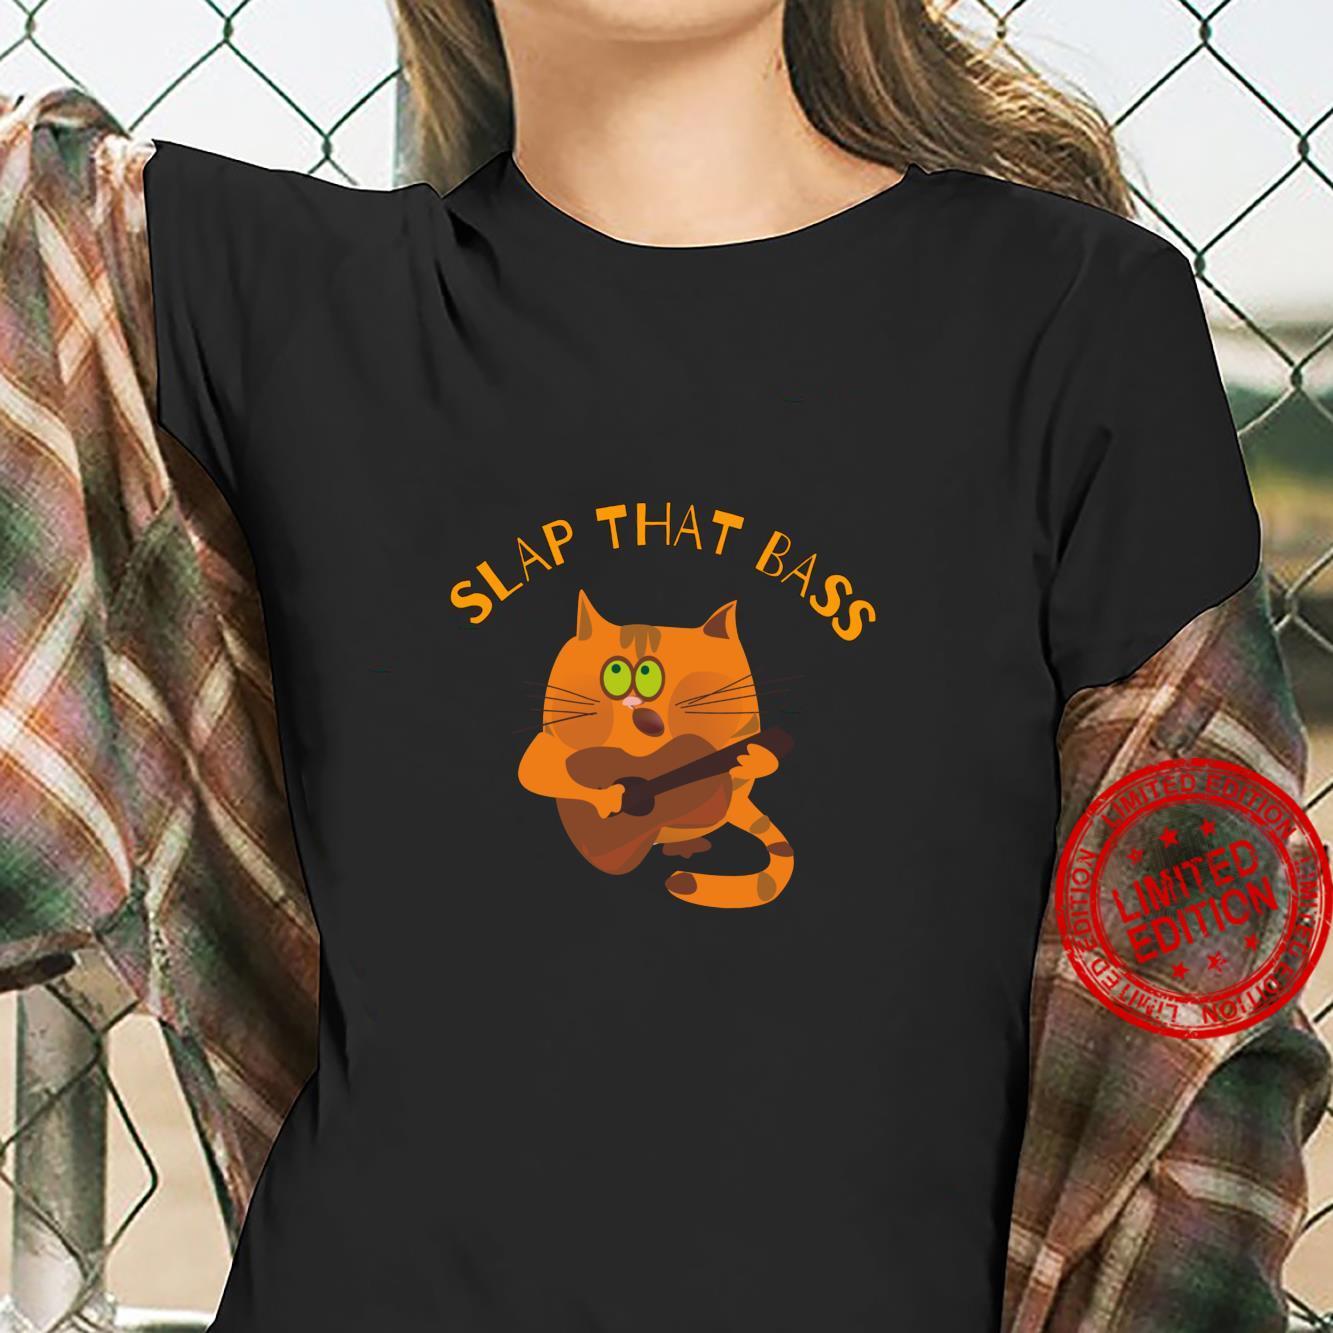 Slap That Bass featuring bass playing kitty cat Shirt ladies tee